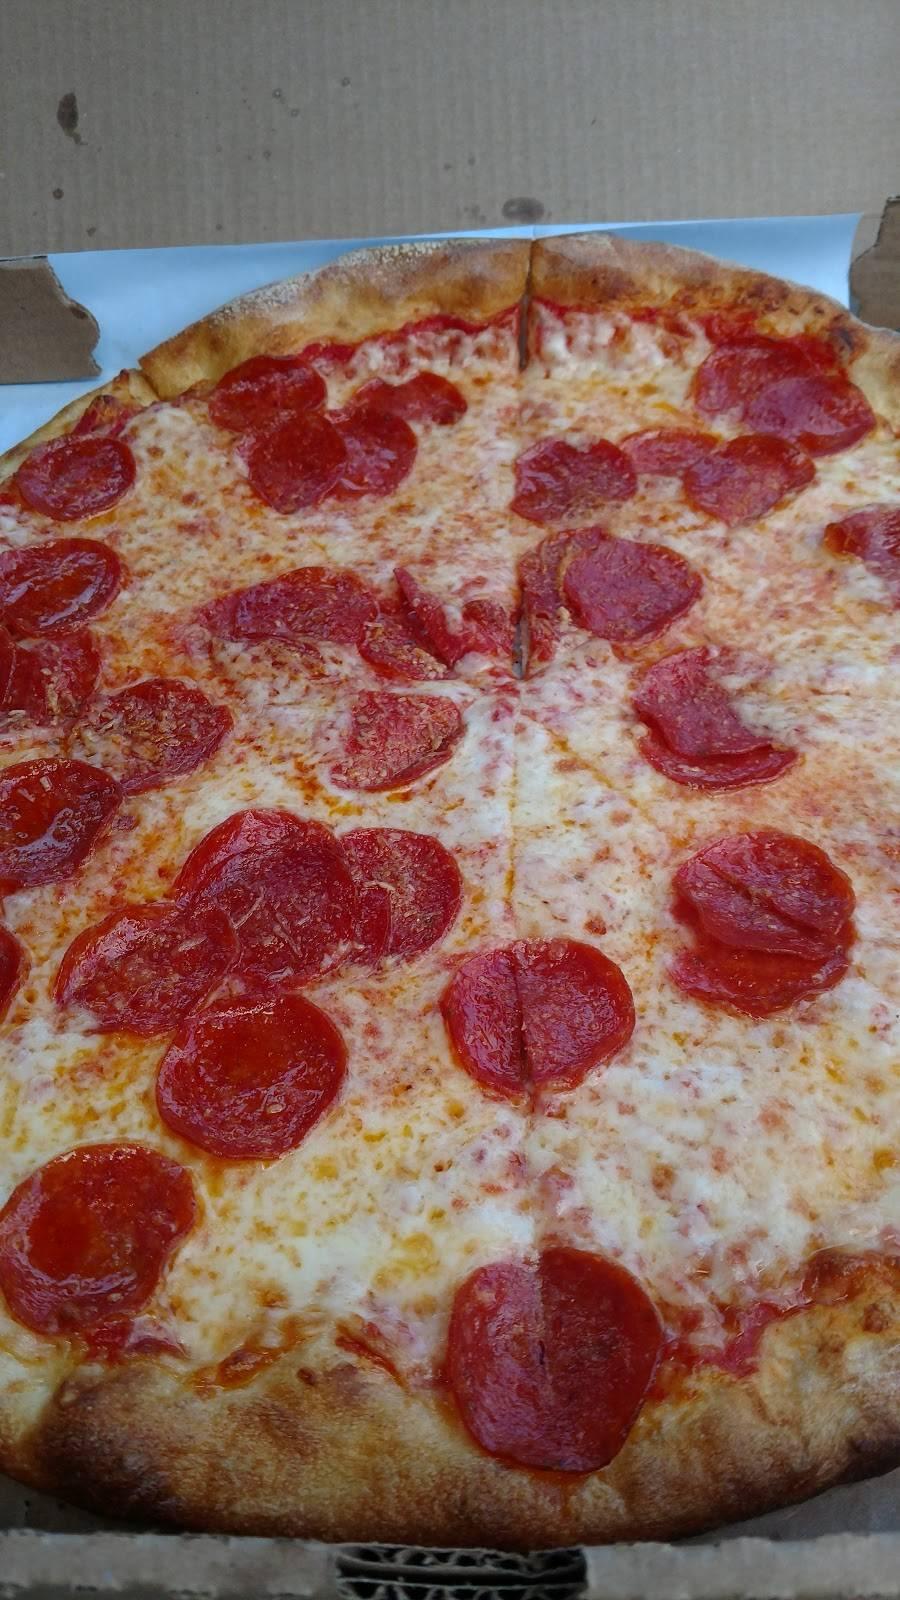 Carminuccio's Pizza | restaurant | 76 S Main St, Newtown, CT 06470, USA | 2033641133 OR +1 203-364-1133